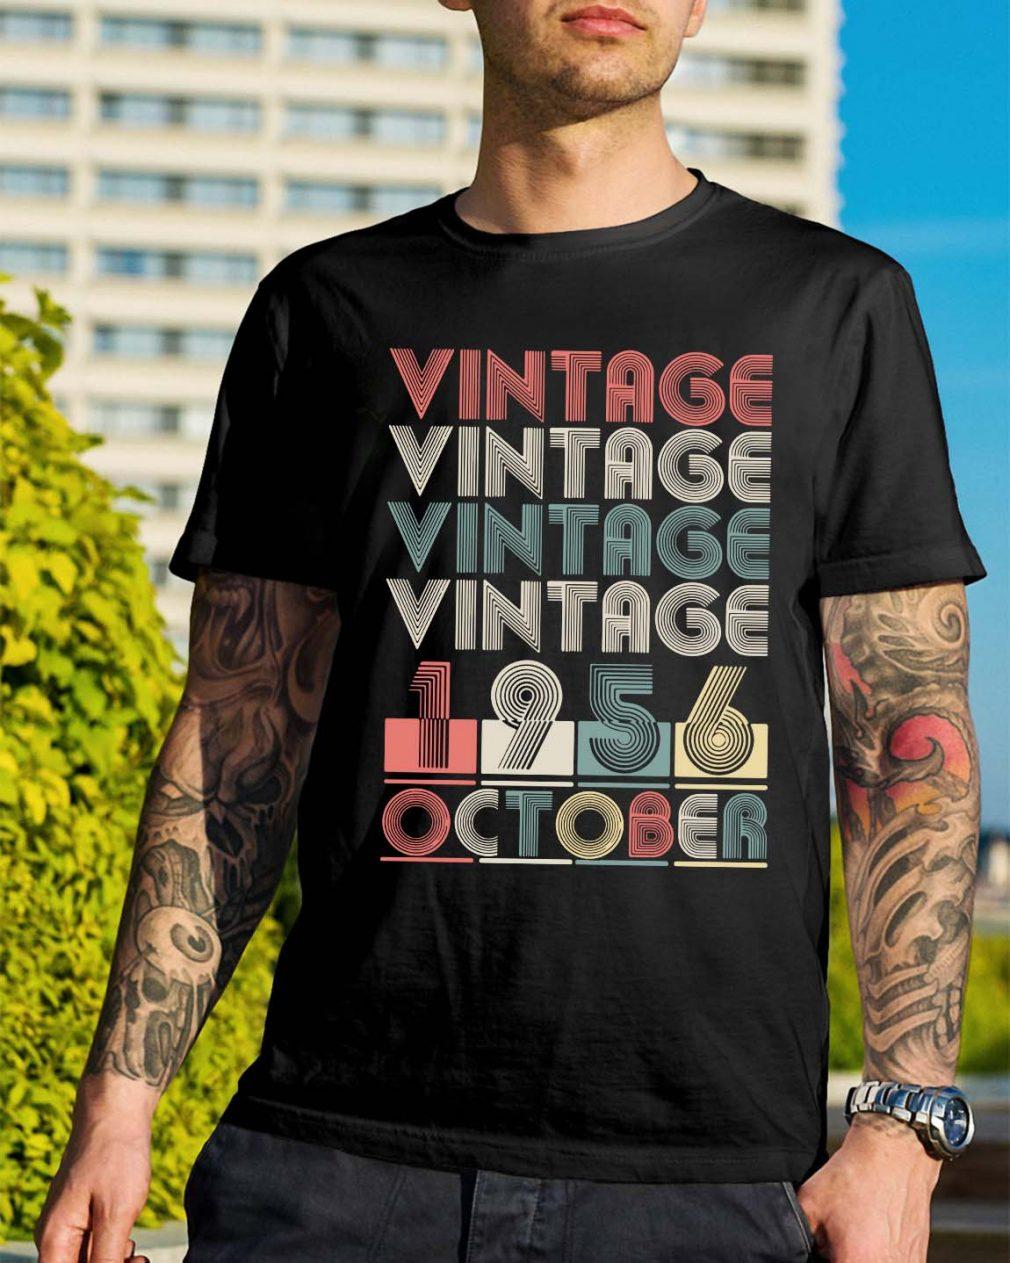 Vintage vintage vintage vintage 1956 October shirt